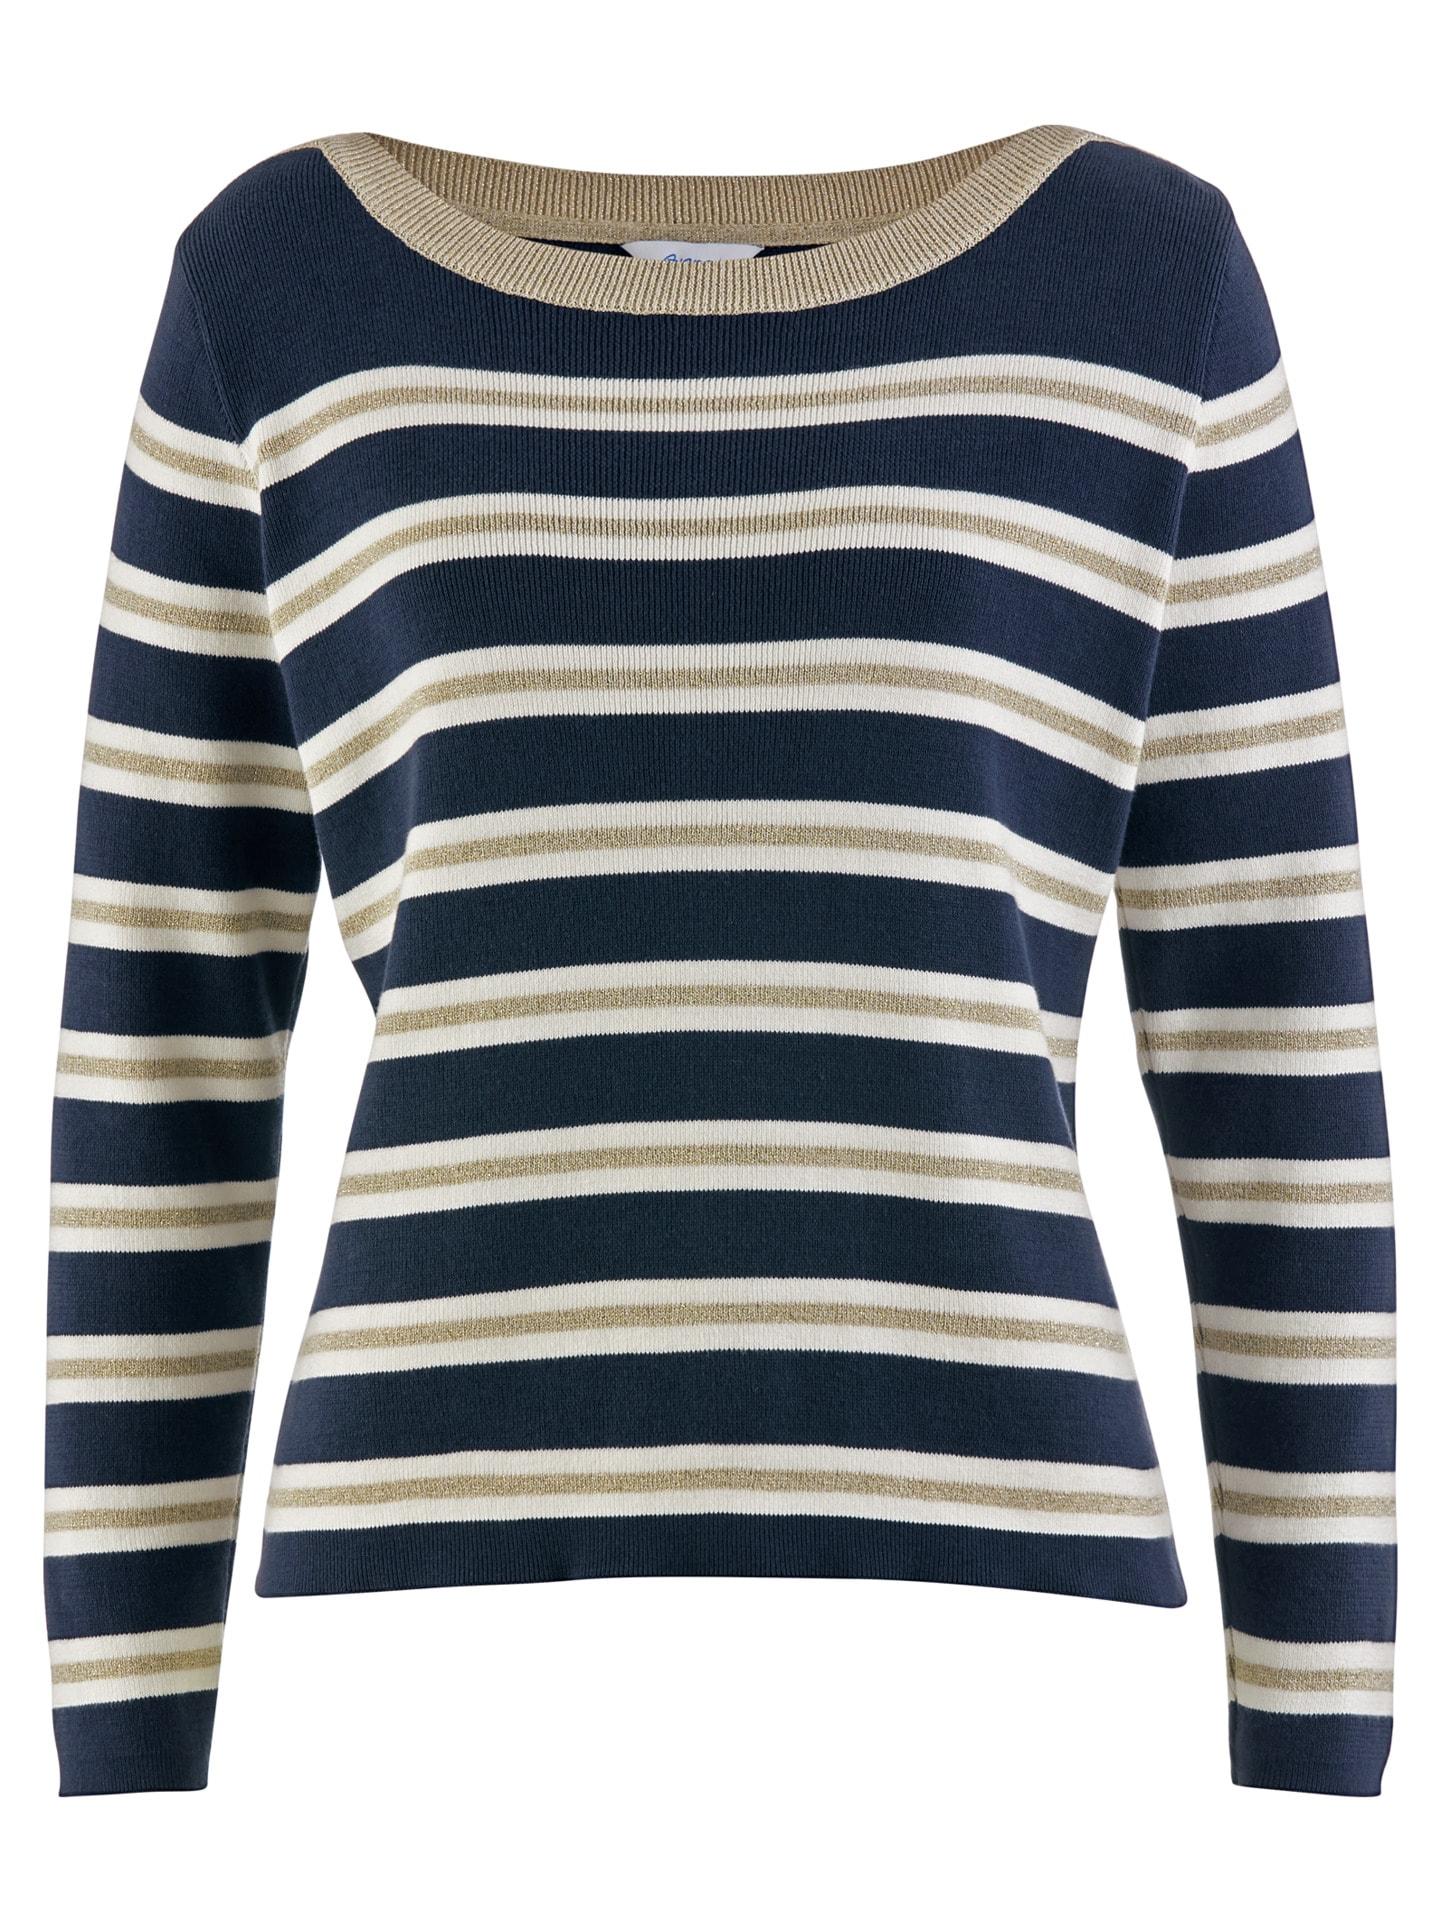 Avena Damen Streifen-Pullover Ruderclub Blau 43-8721-1